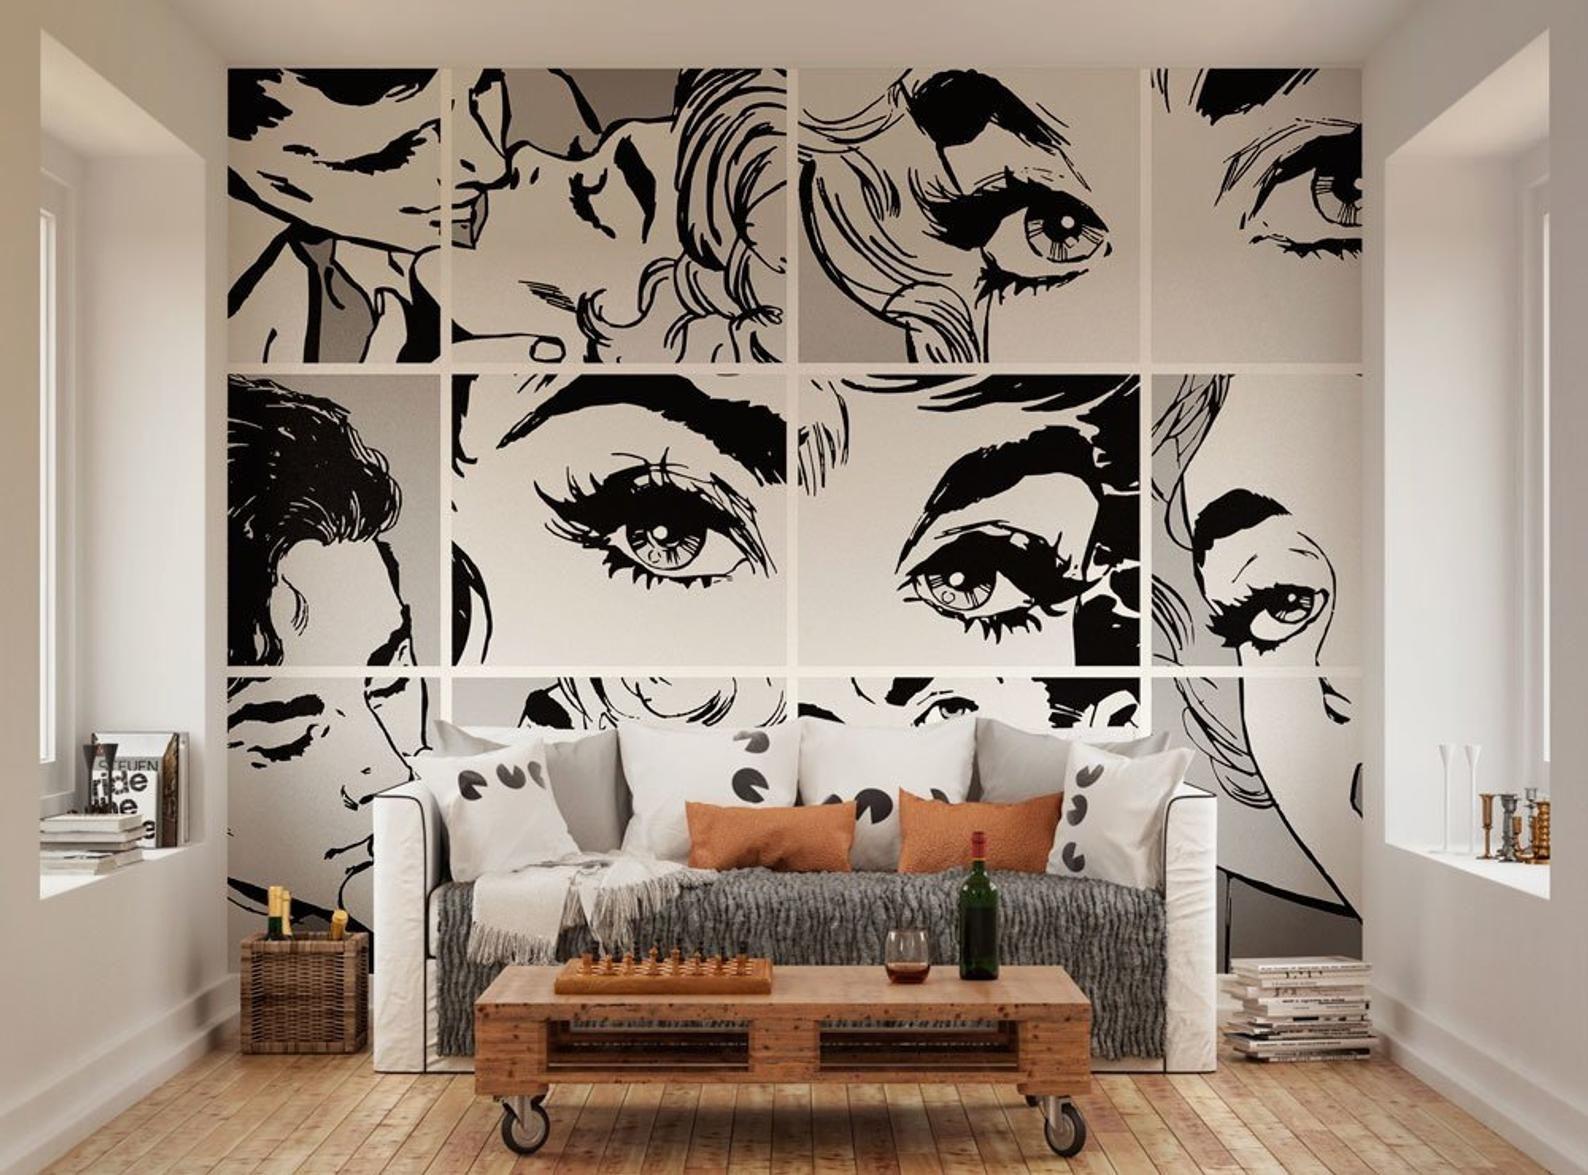 Black White Pop Art Wall Mural Self Adhesive Removable Etsy Pop Art Decor Interior Art Art Decor